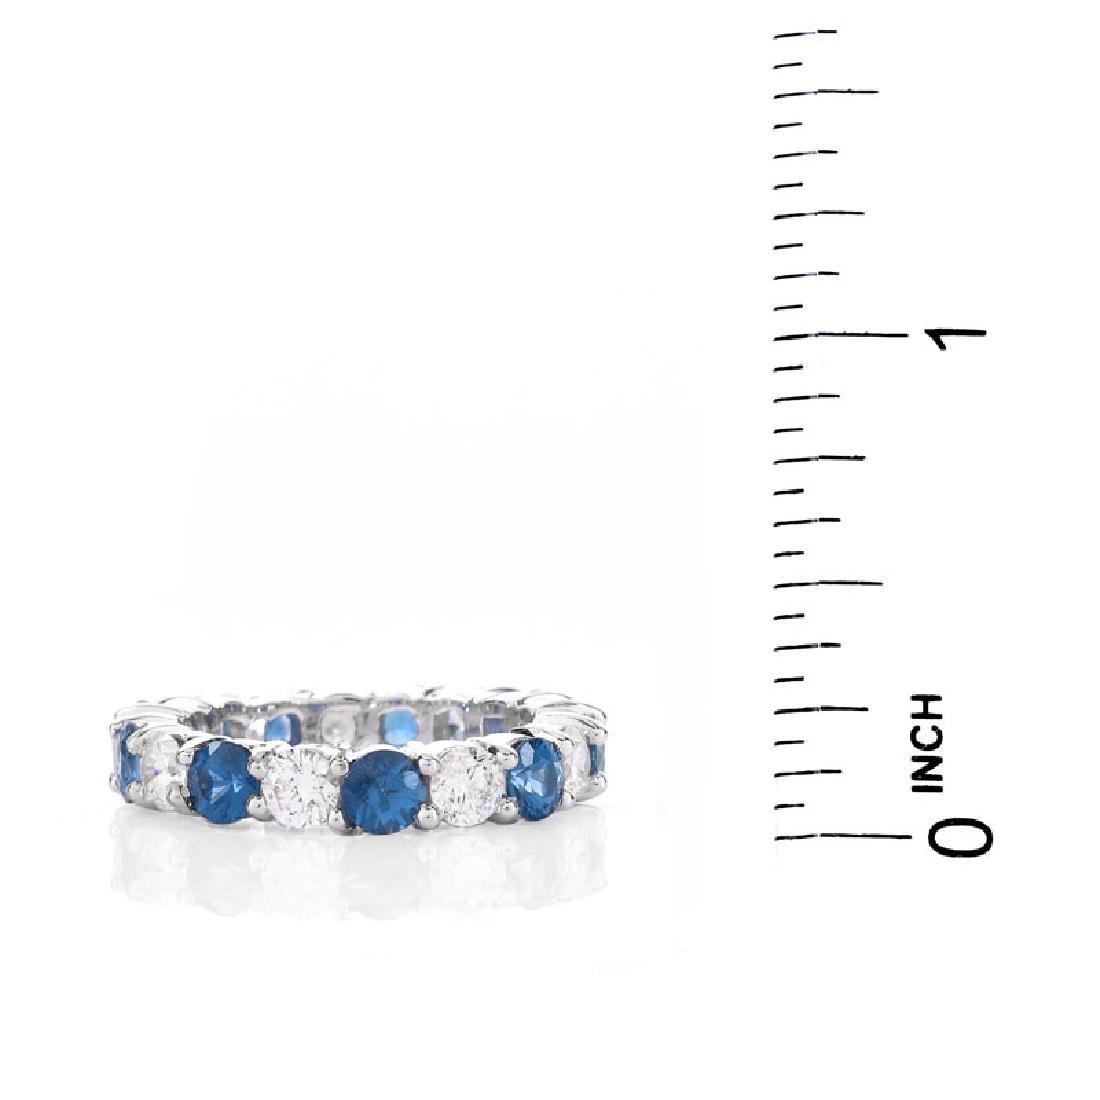 Approx. 2.62 Carat Round Brilliant Cut Sapphire, 1.85 - 6